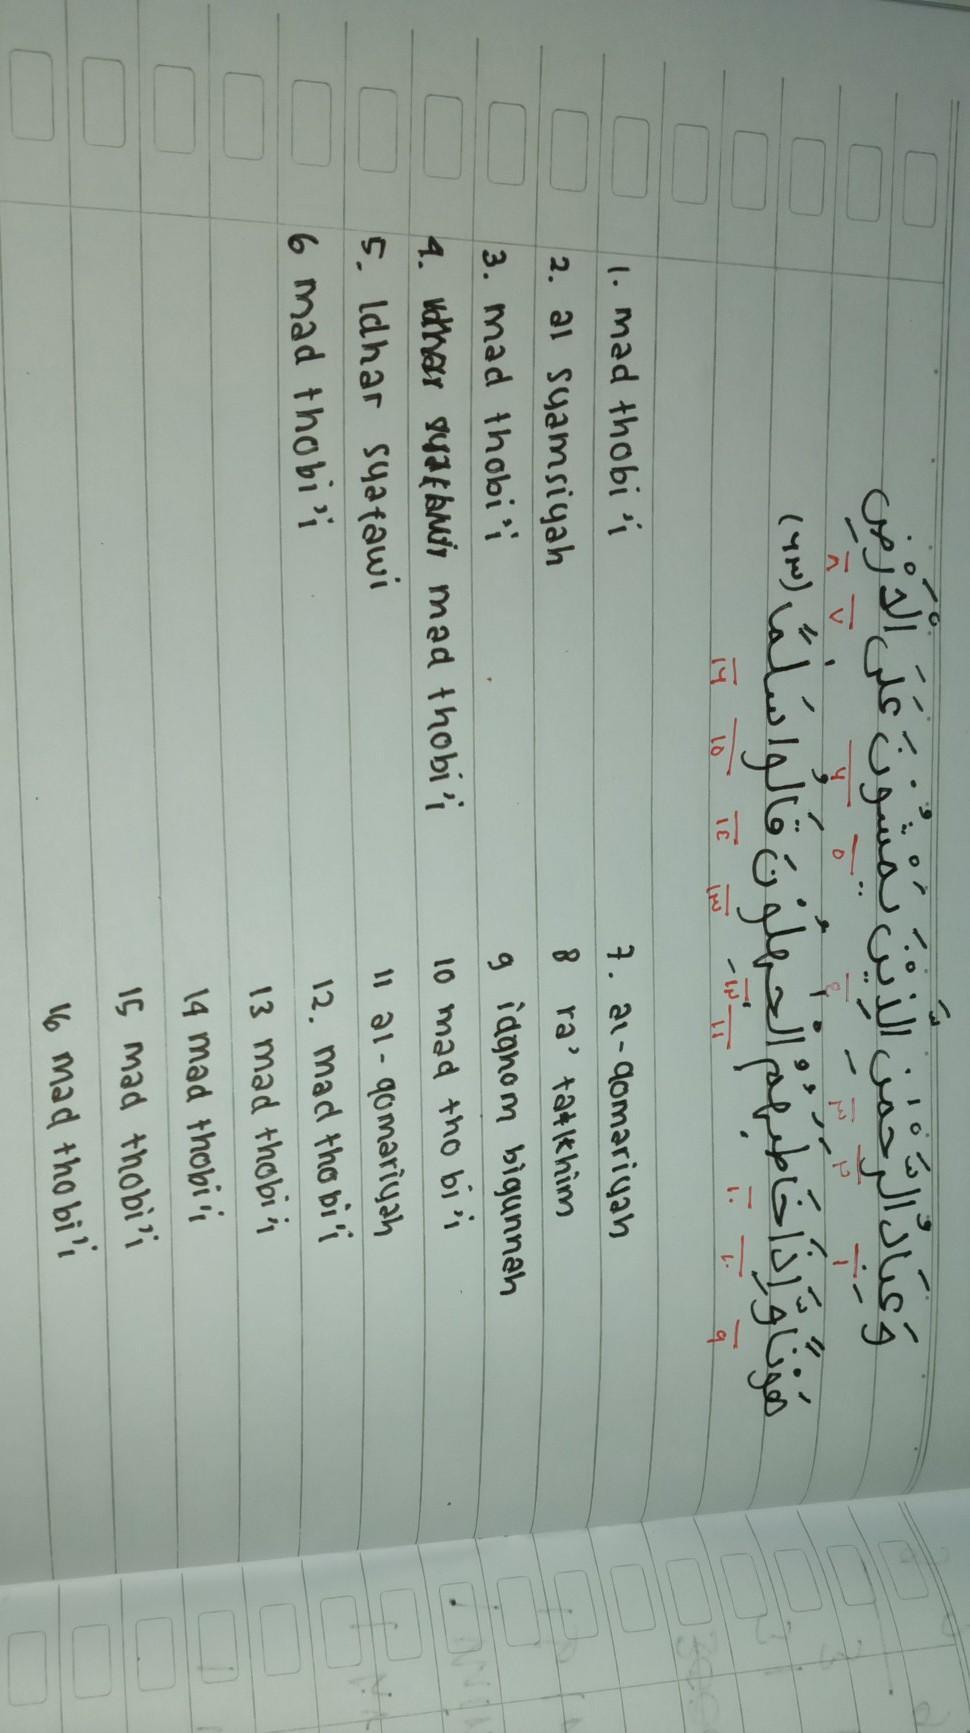 Tajwid Surat Al Isra Ayat 26 27 : tajwid, surat, Amati, Surat, Furqan:, Carilah, Hukum, Bacaan, Kedua, Tersebut, Brainly.co.id